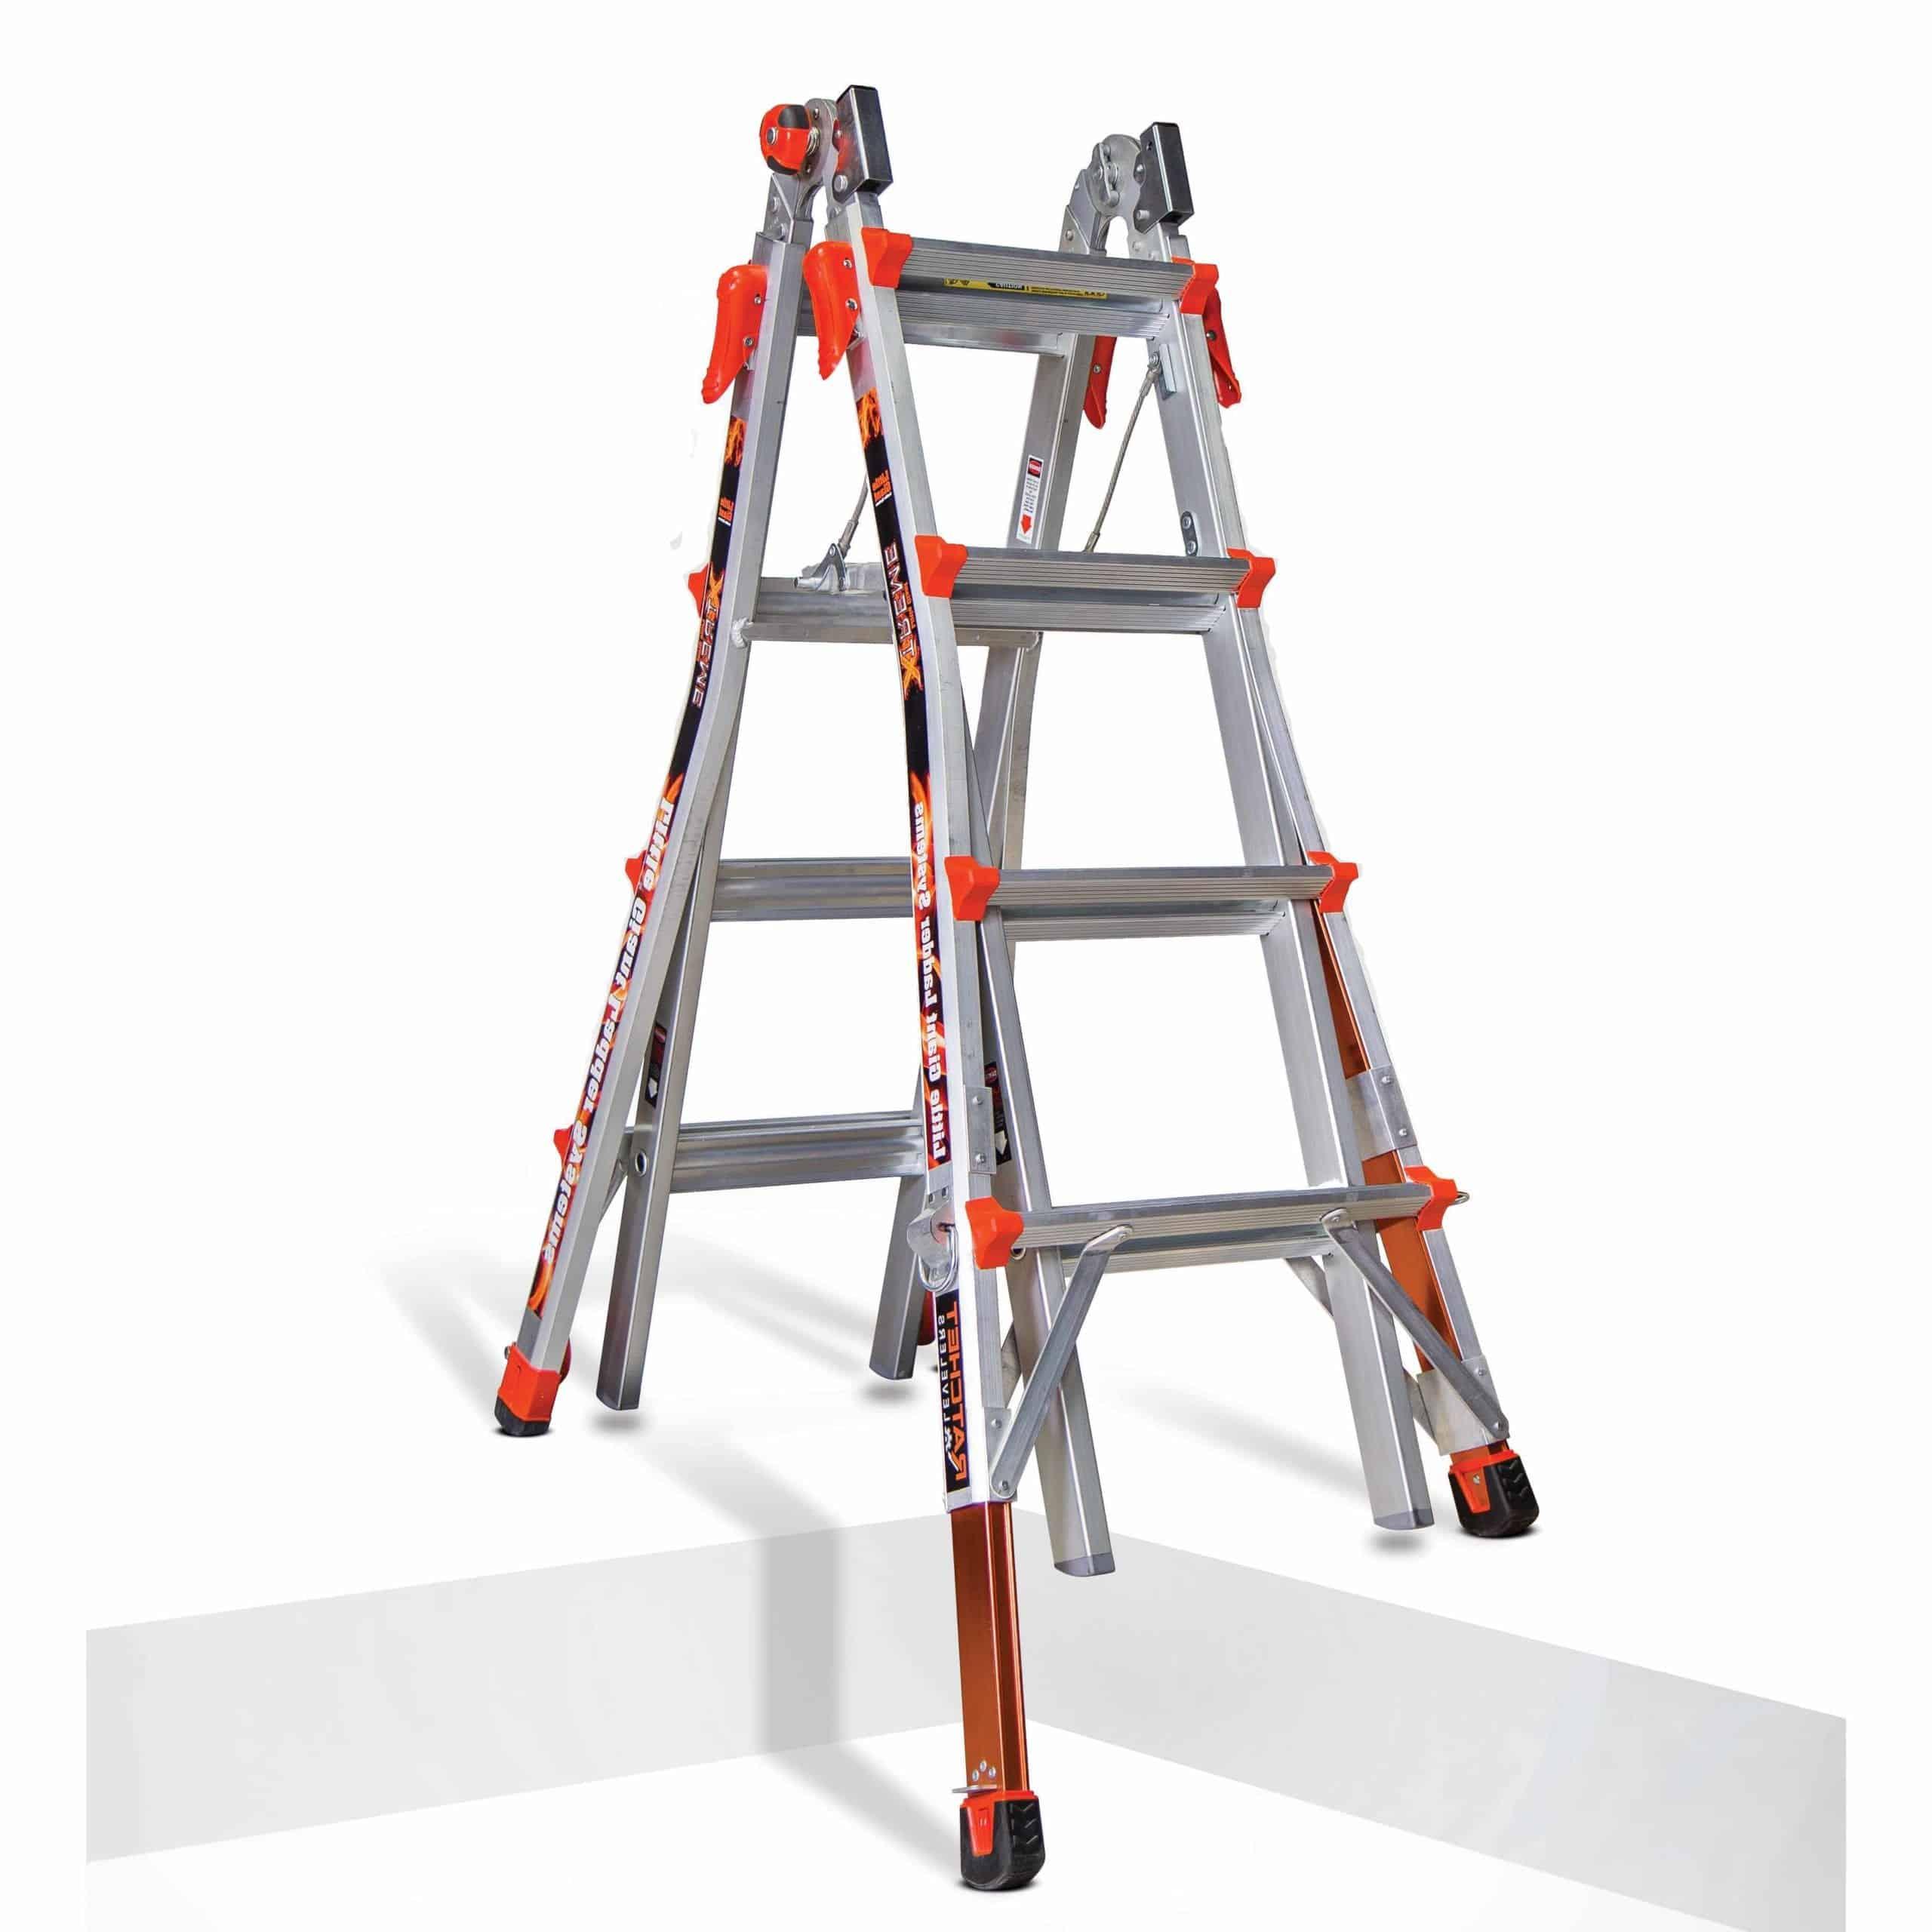 Xtreme Multi-Purpose Ladders